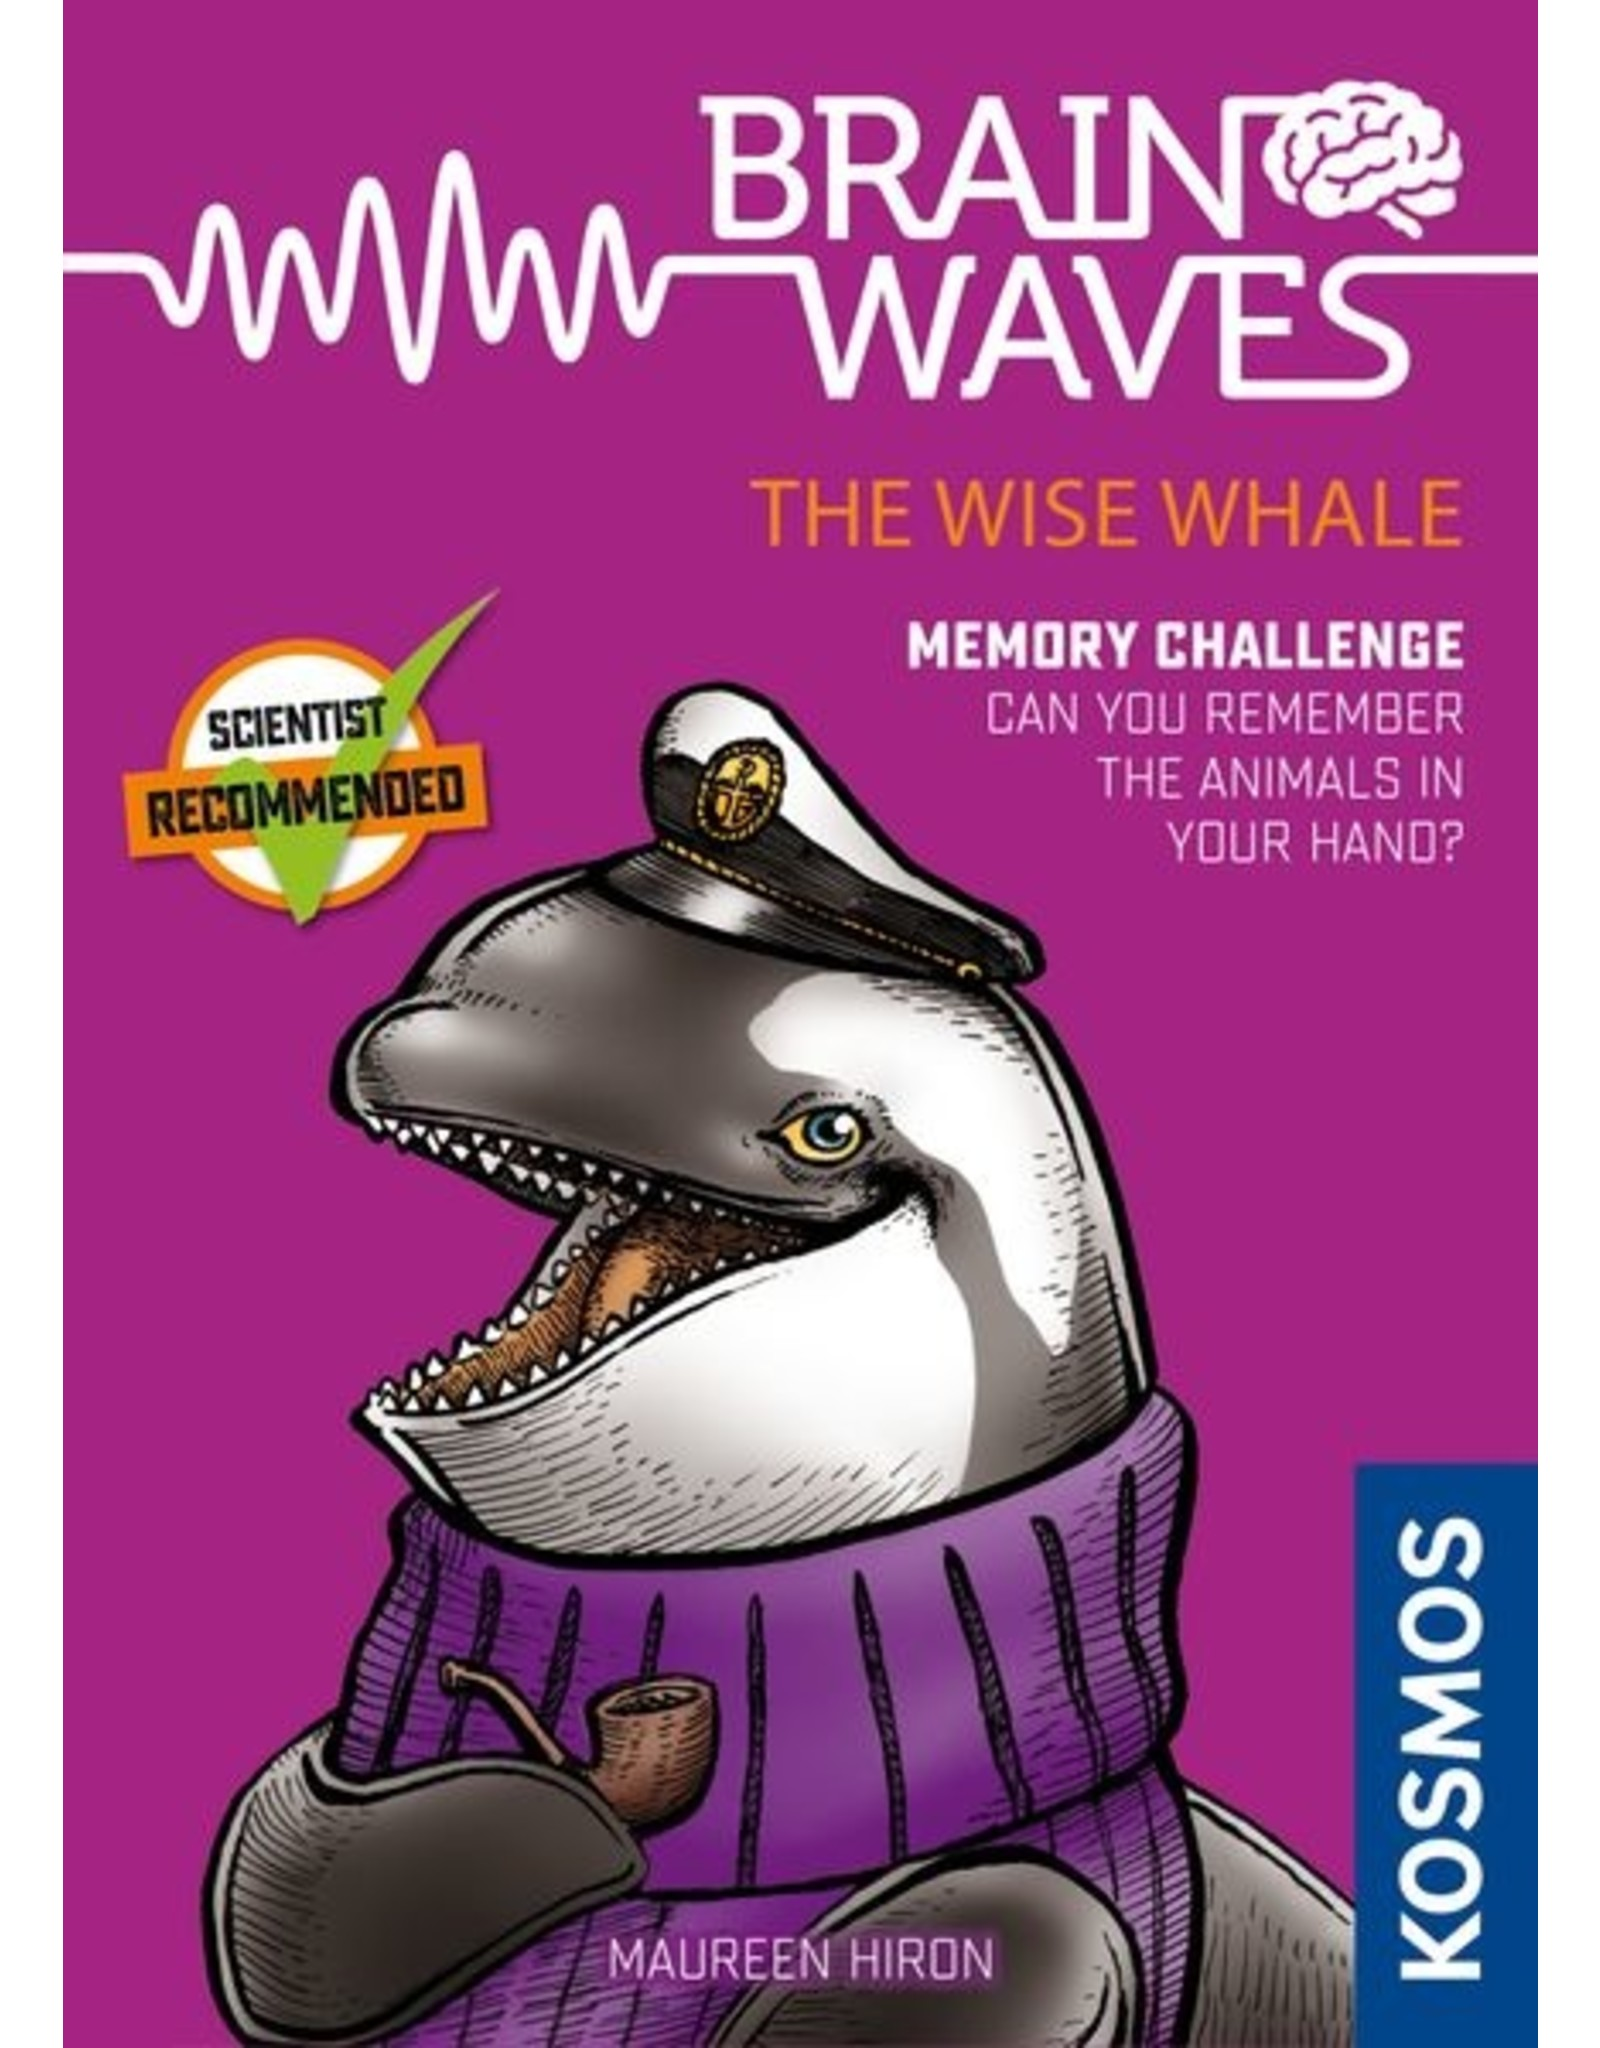 Thames & Kosmos Brain Waves: The Wise Whale